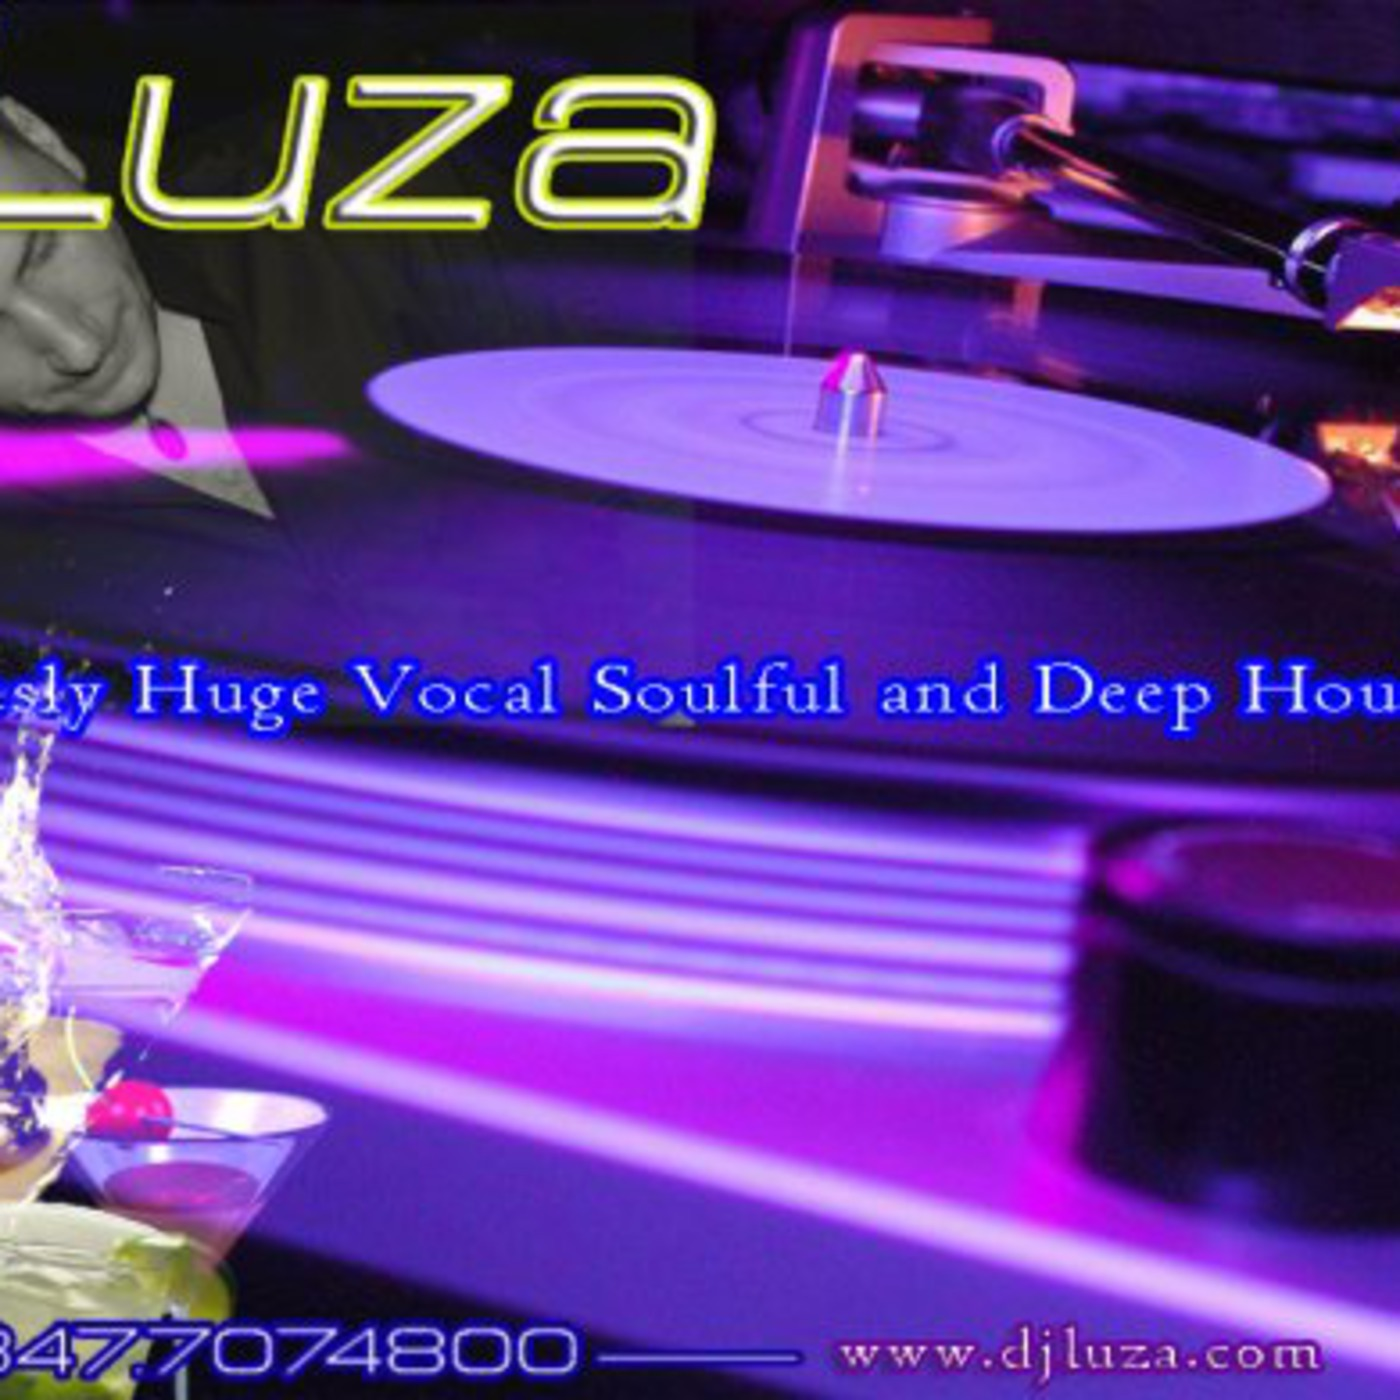 Luza's Podcast